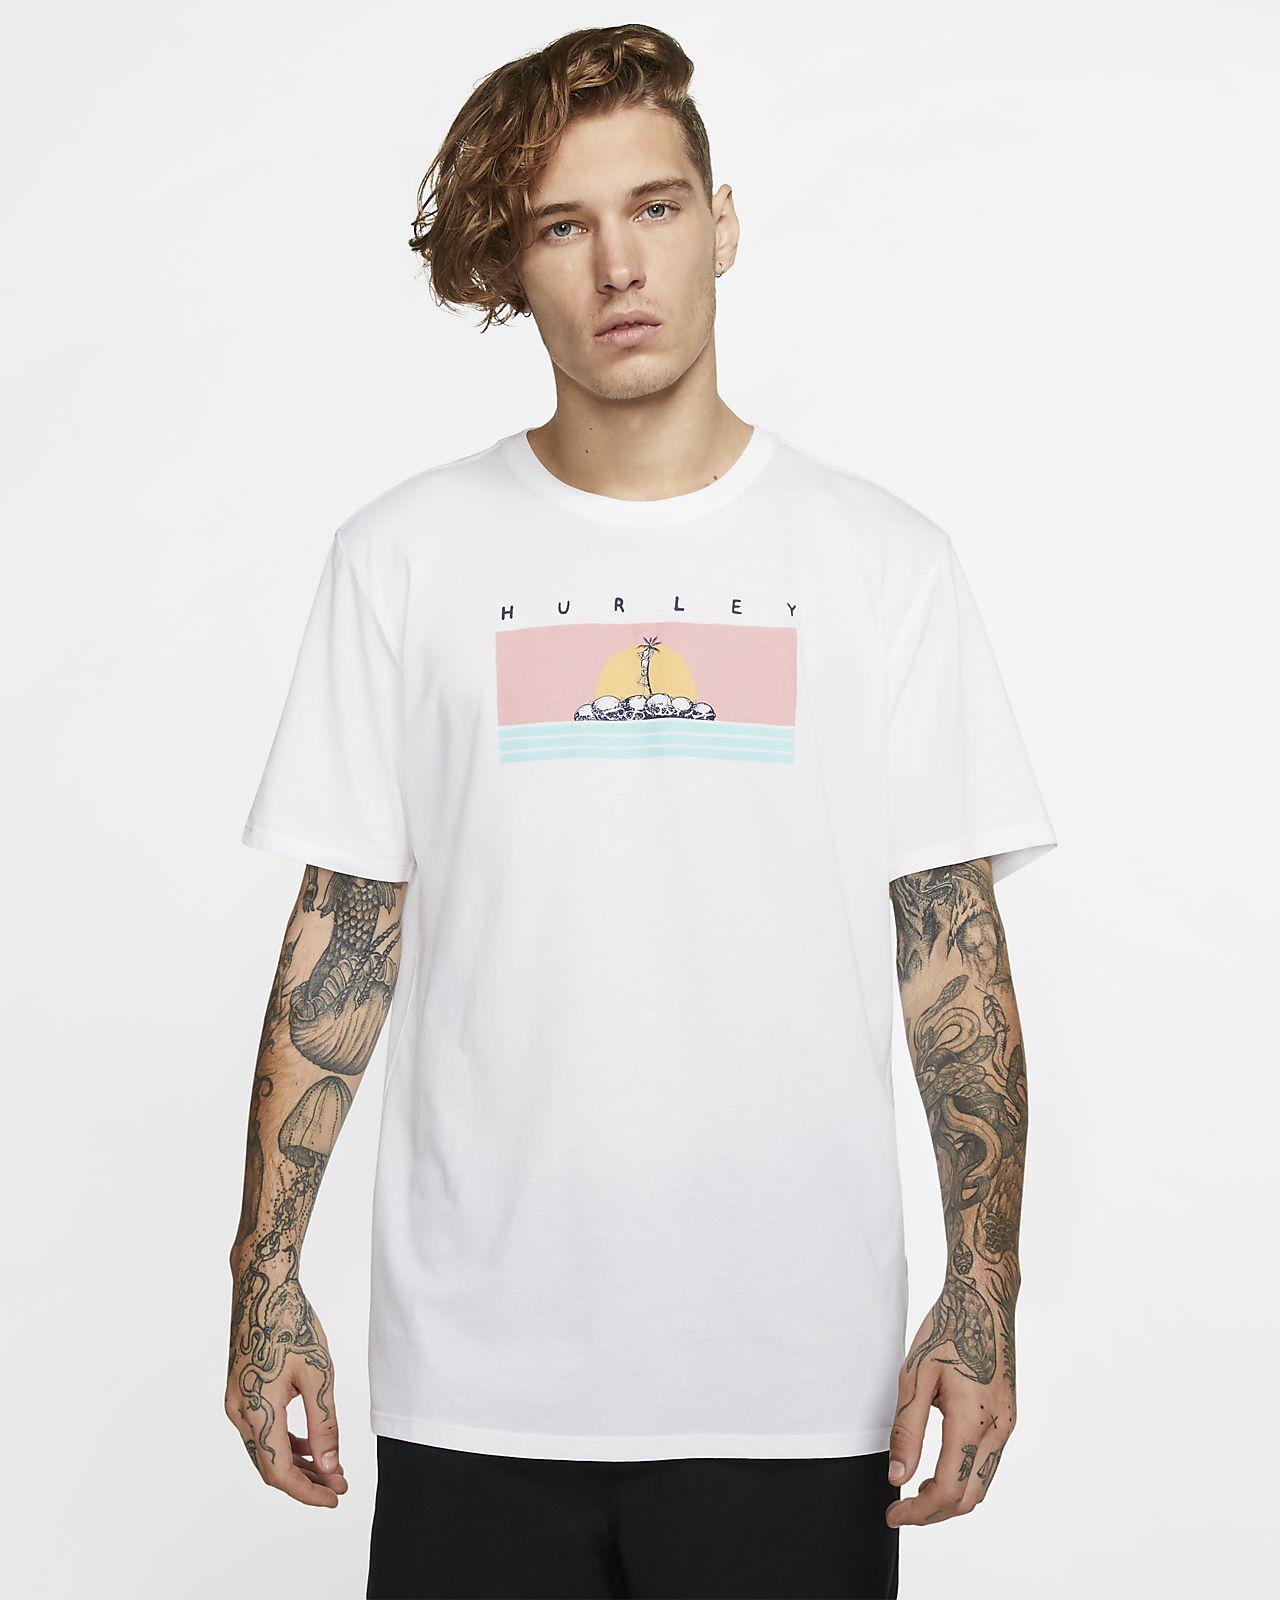 Męski T-shirt Premium Fit Hurley Dri-FIT Deserted